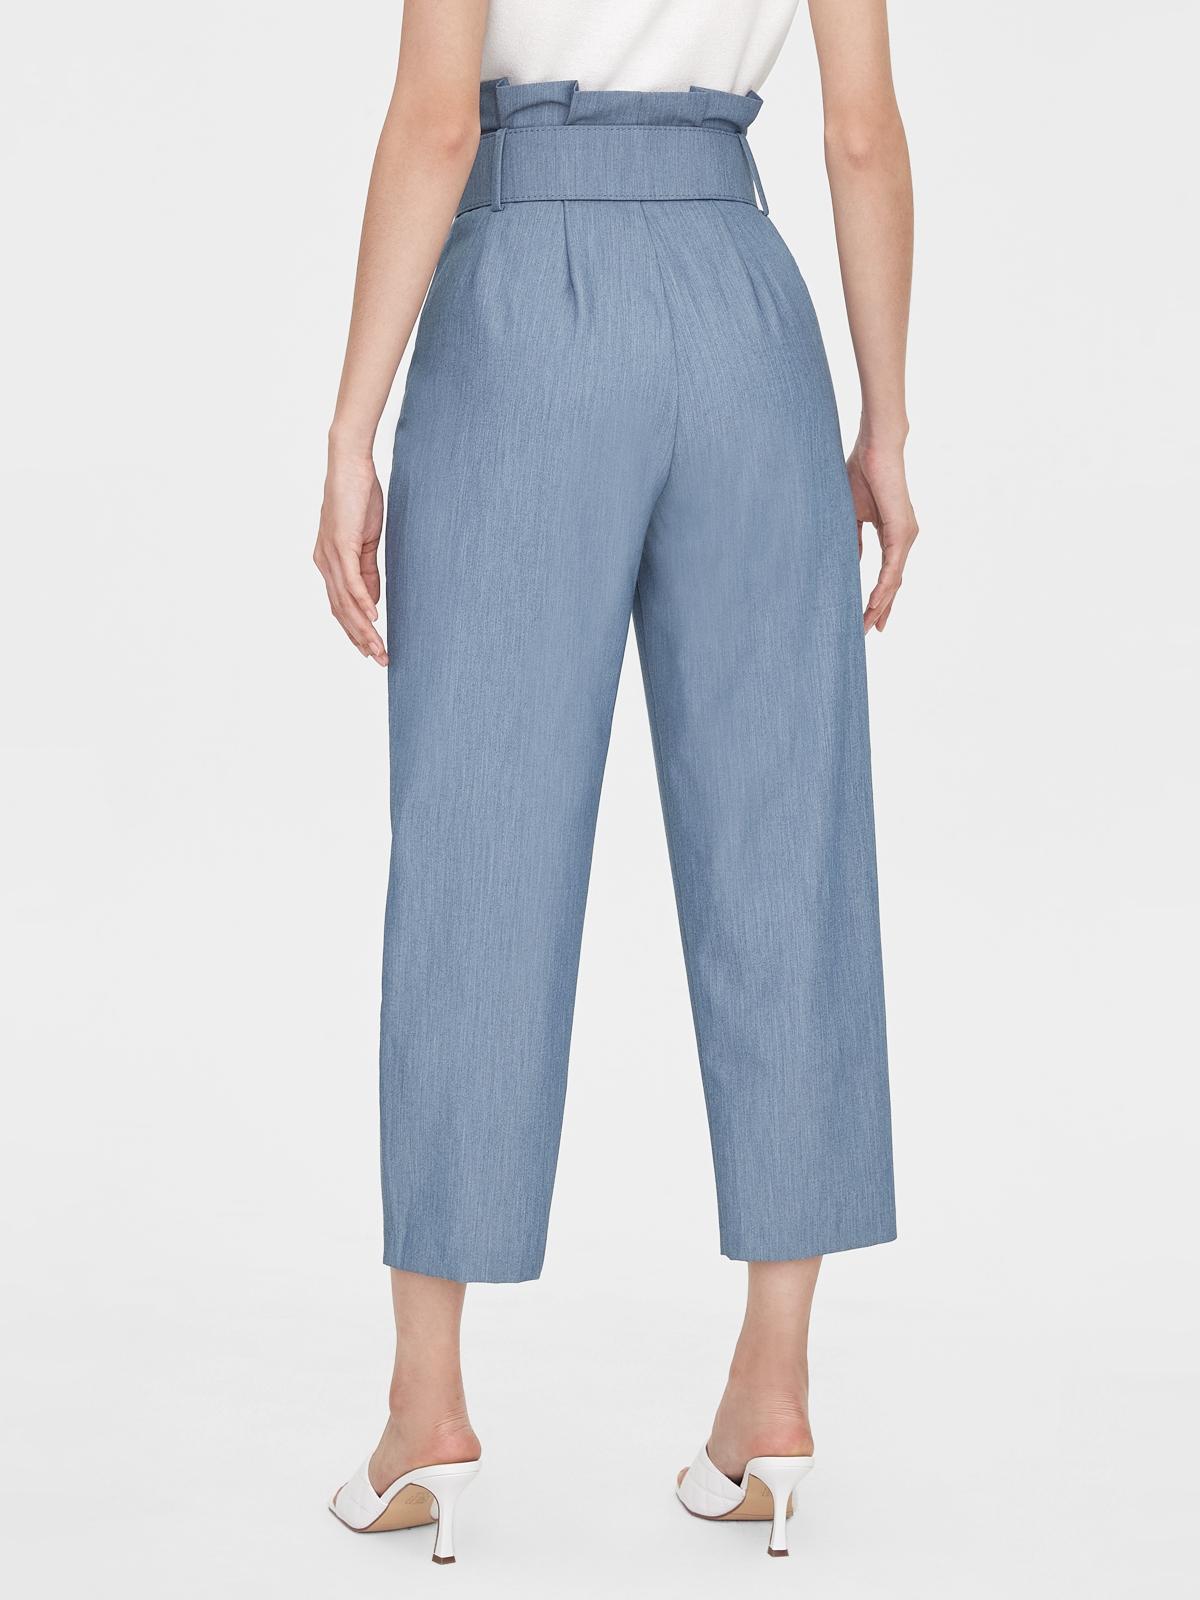 Belted Paper Bag High Waist Pants Blue